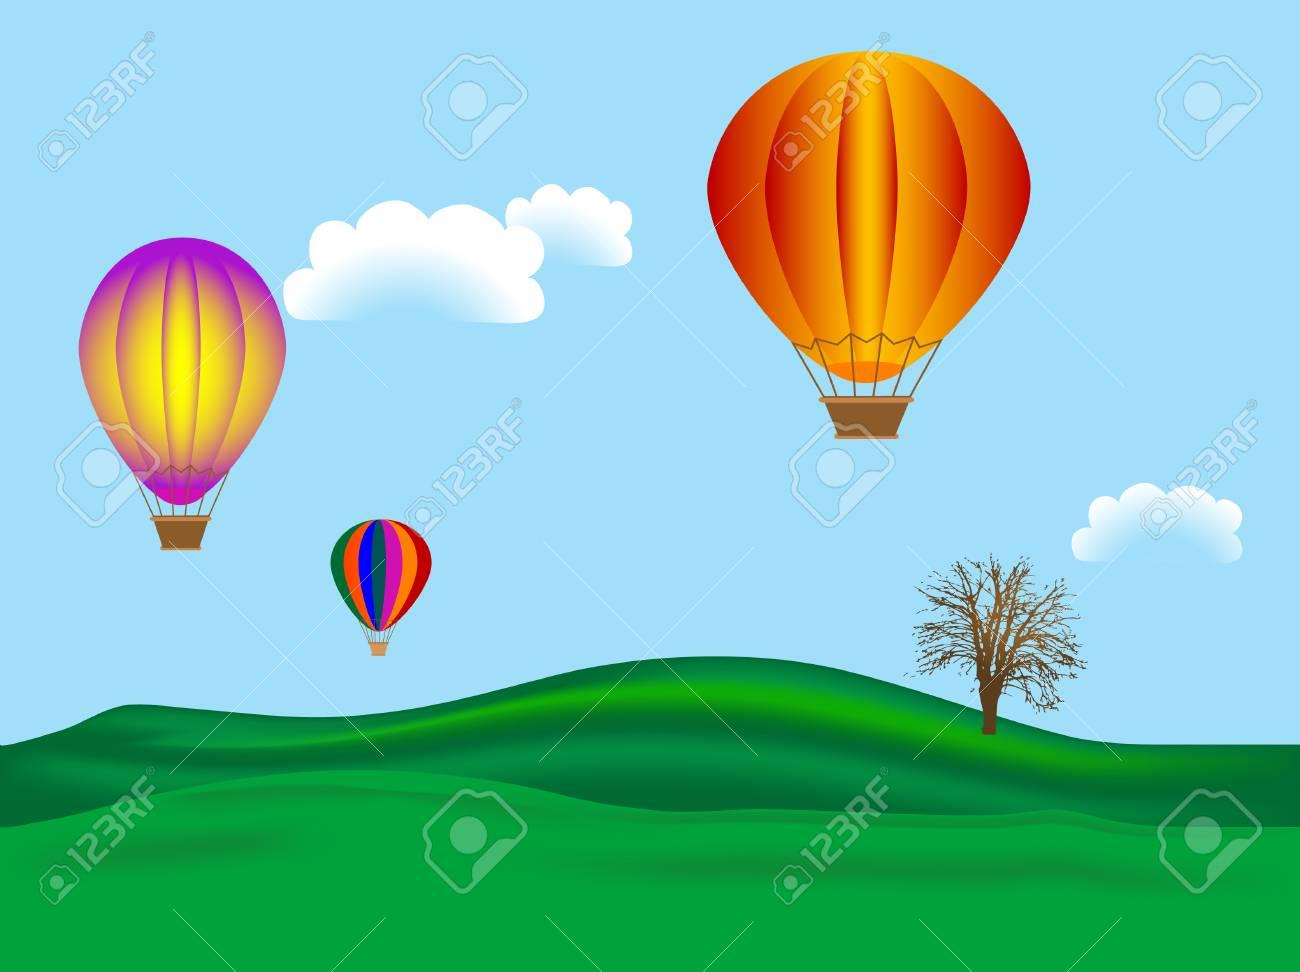 Hot air balloons - vector illustration Stock Vector - 3326734